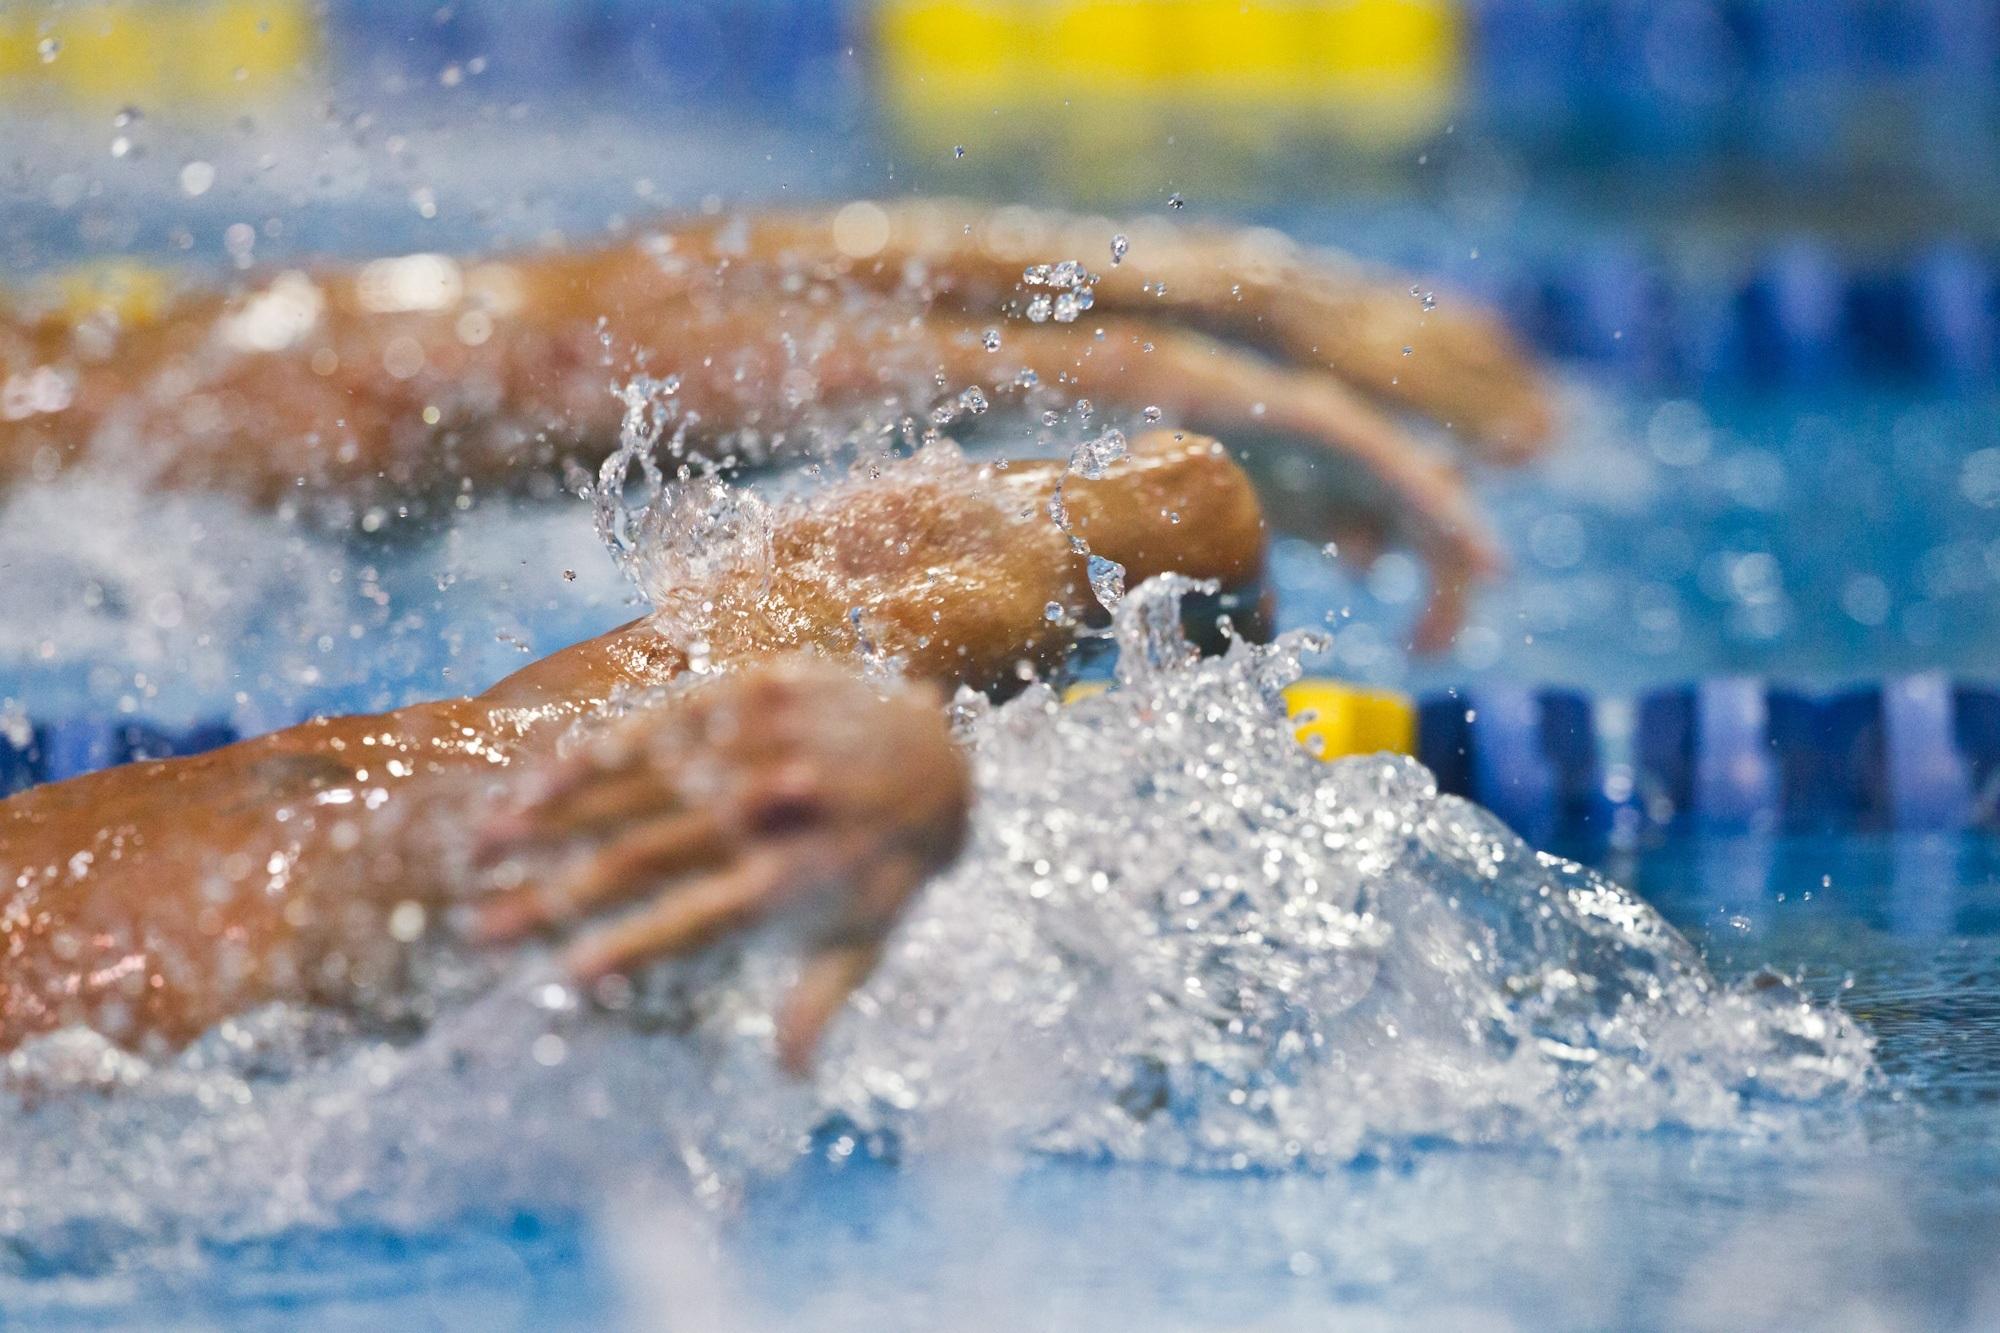 And swimming hot pics 71